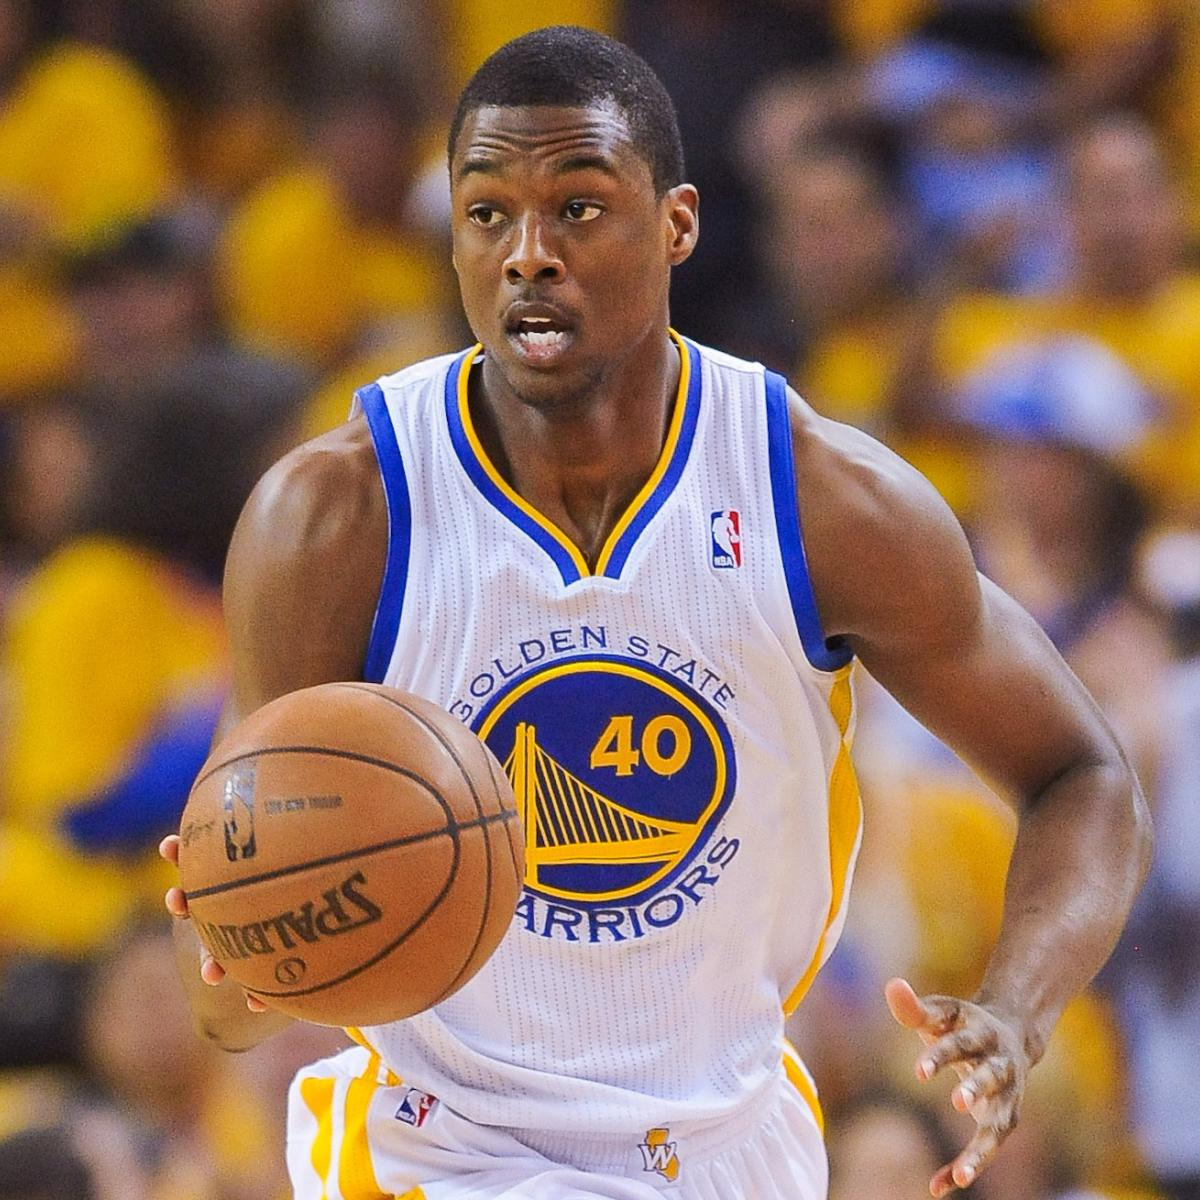 Harrison Barnes Nba: Harrison Barnes Injury: Updates On Warriors Forward's Foot